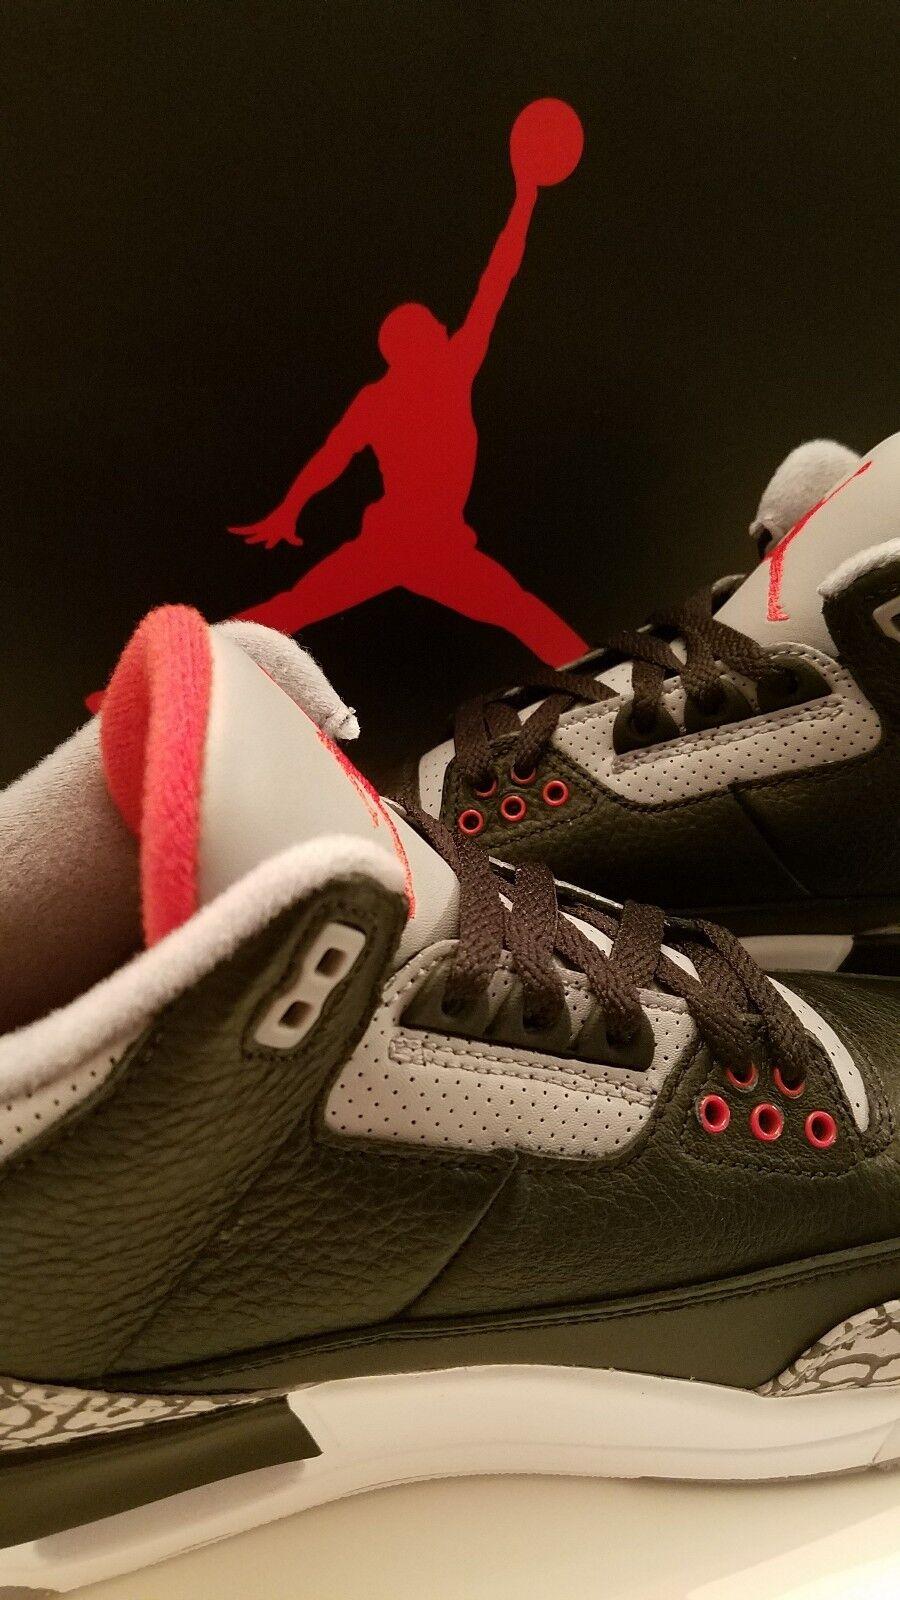 Air Jordan 3 Black Cement Retro III OG 854262 001 Size 8.5 w VTG Jordan Jersey